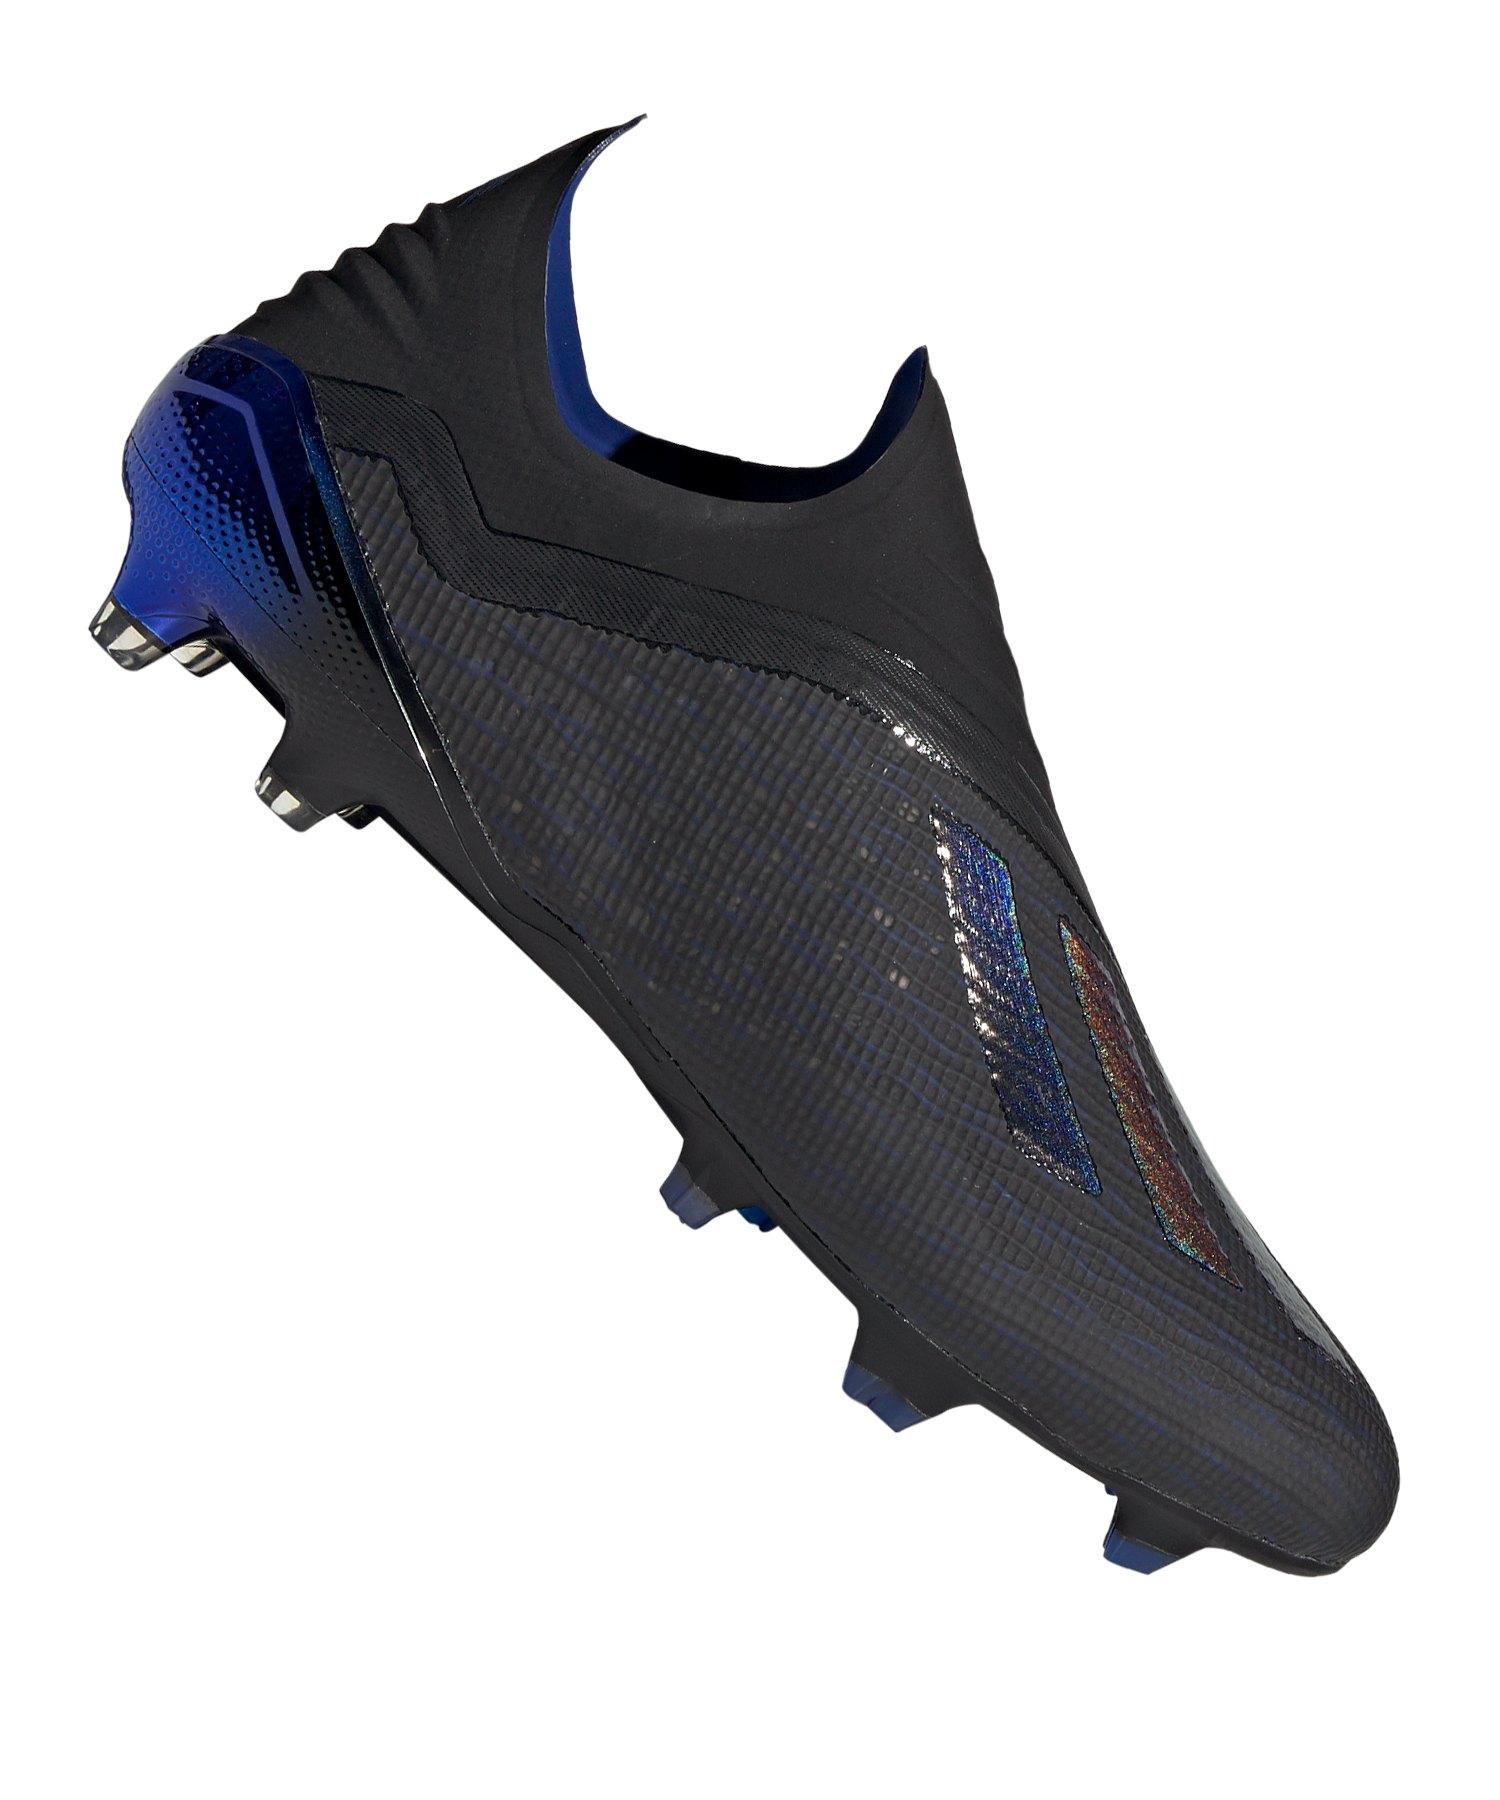 Fussballschuhe Selber Gestalten Adidas Adidas X 18 Tr